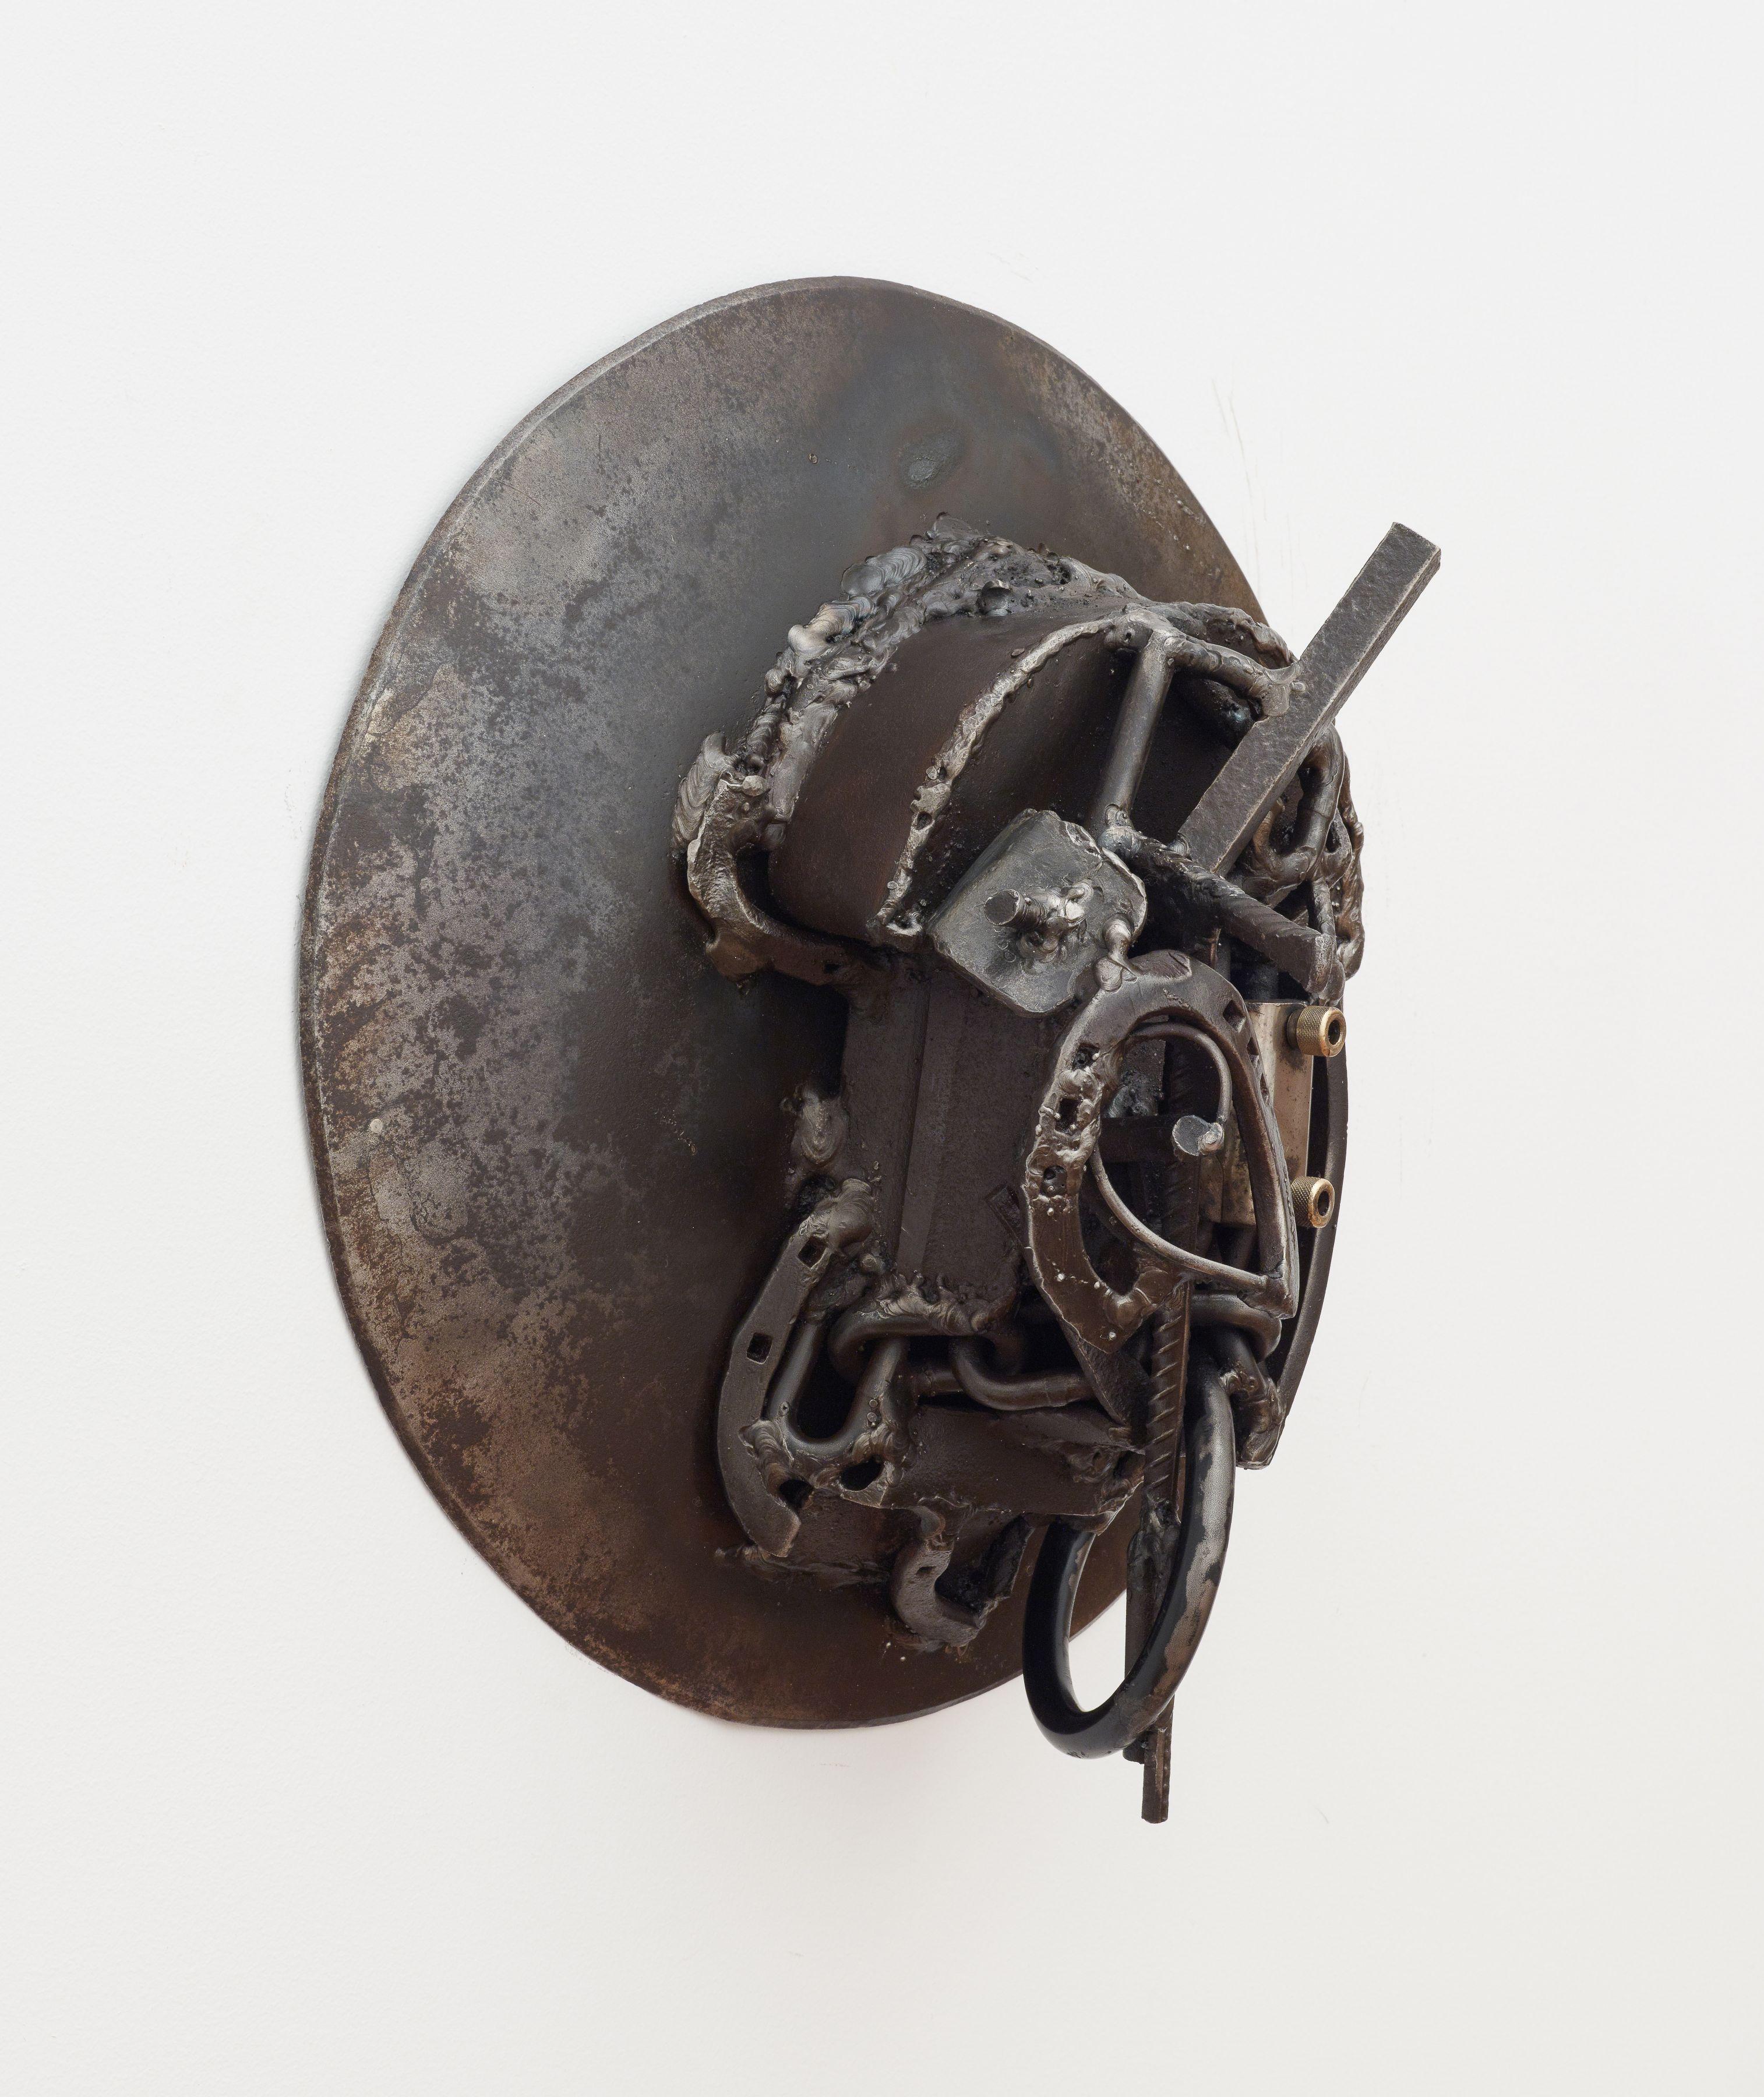 MMOZ, 2005, Welded steel